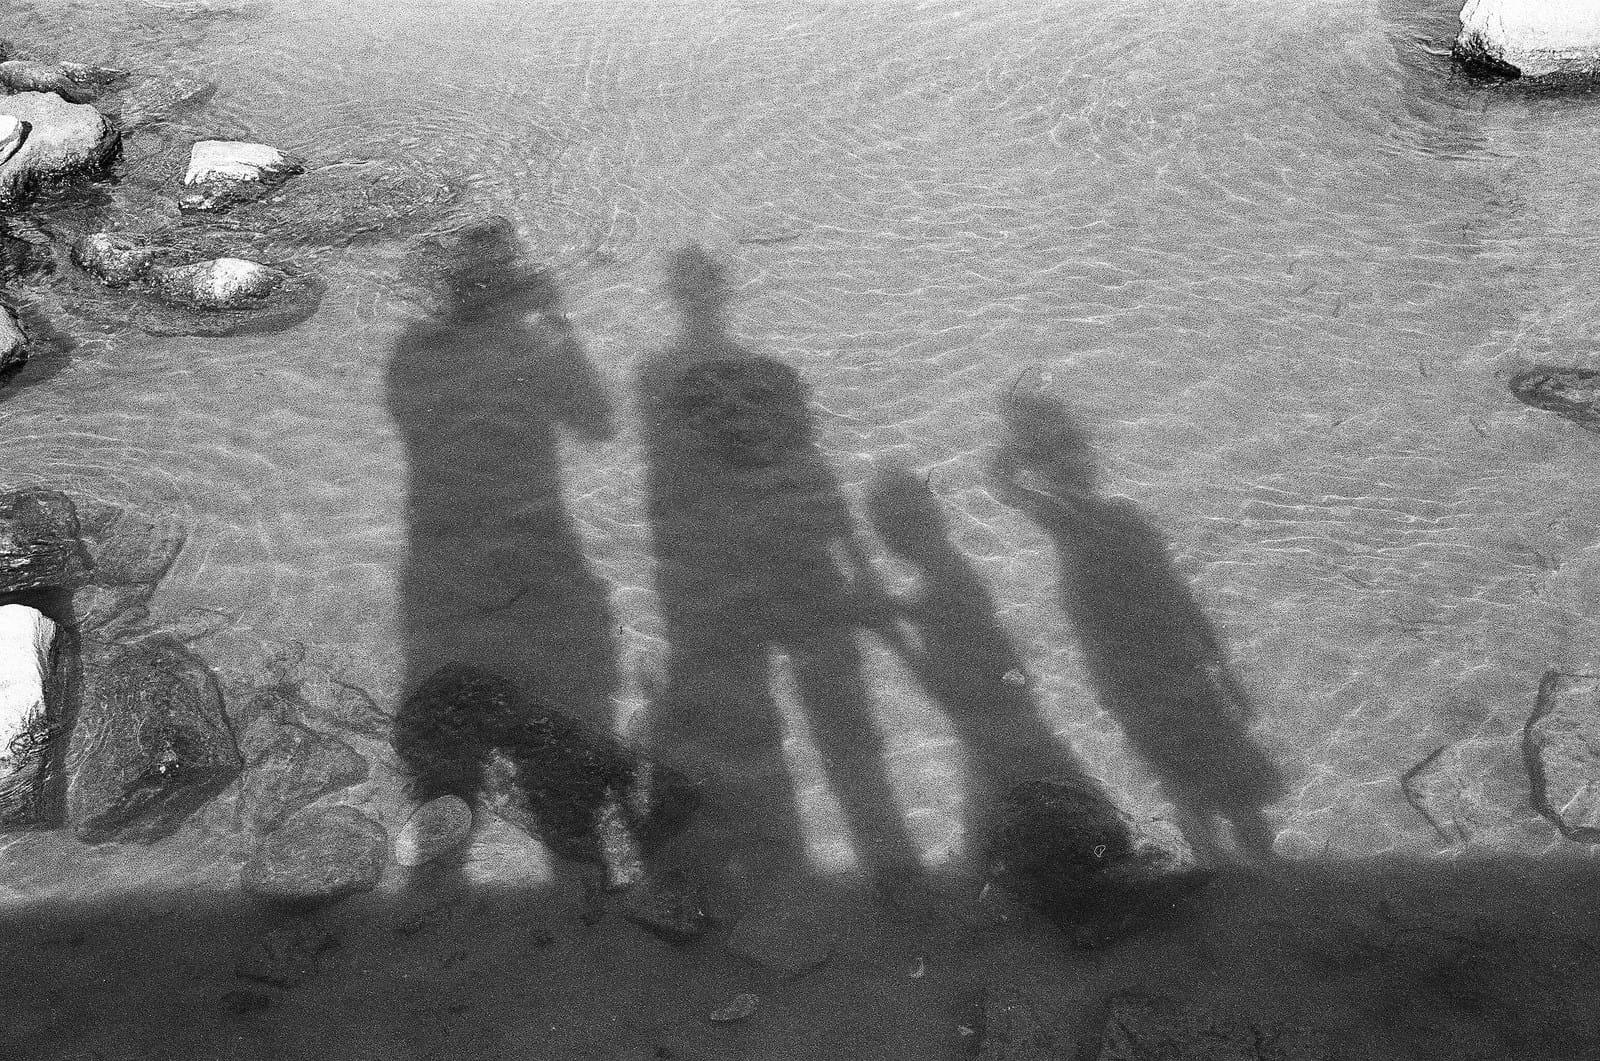 """Family"" by Spyros Papaspyropoulos"